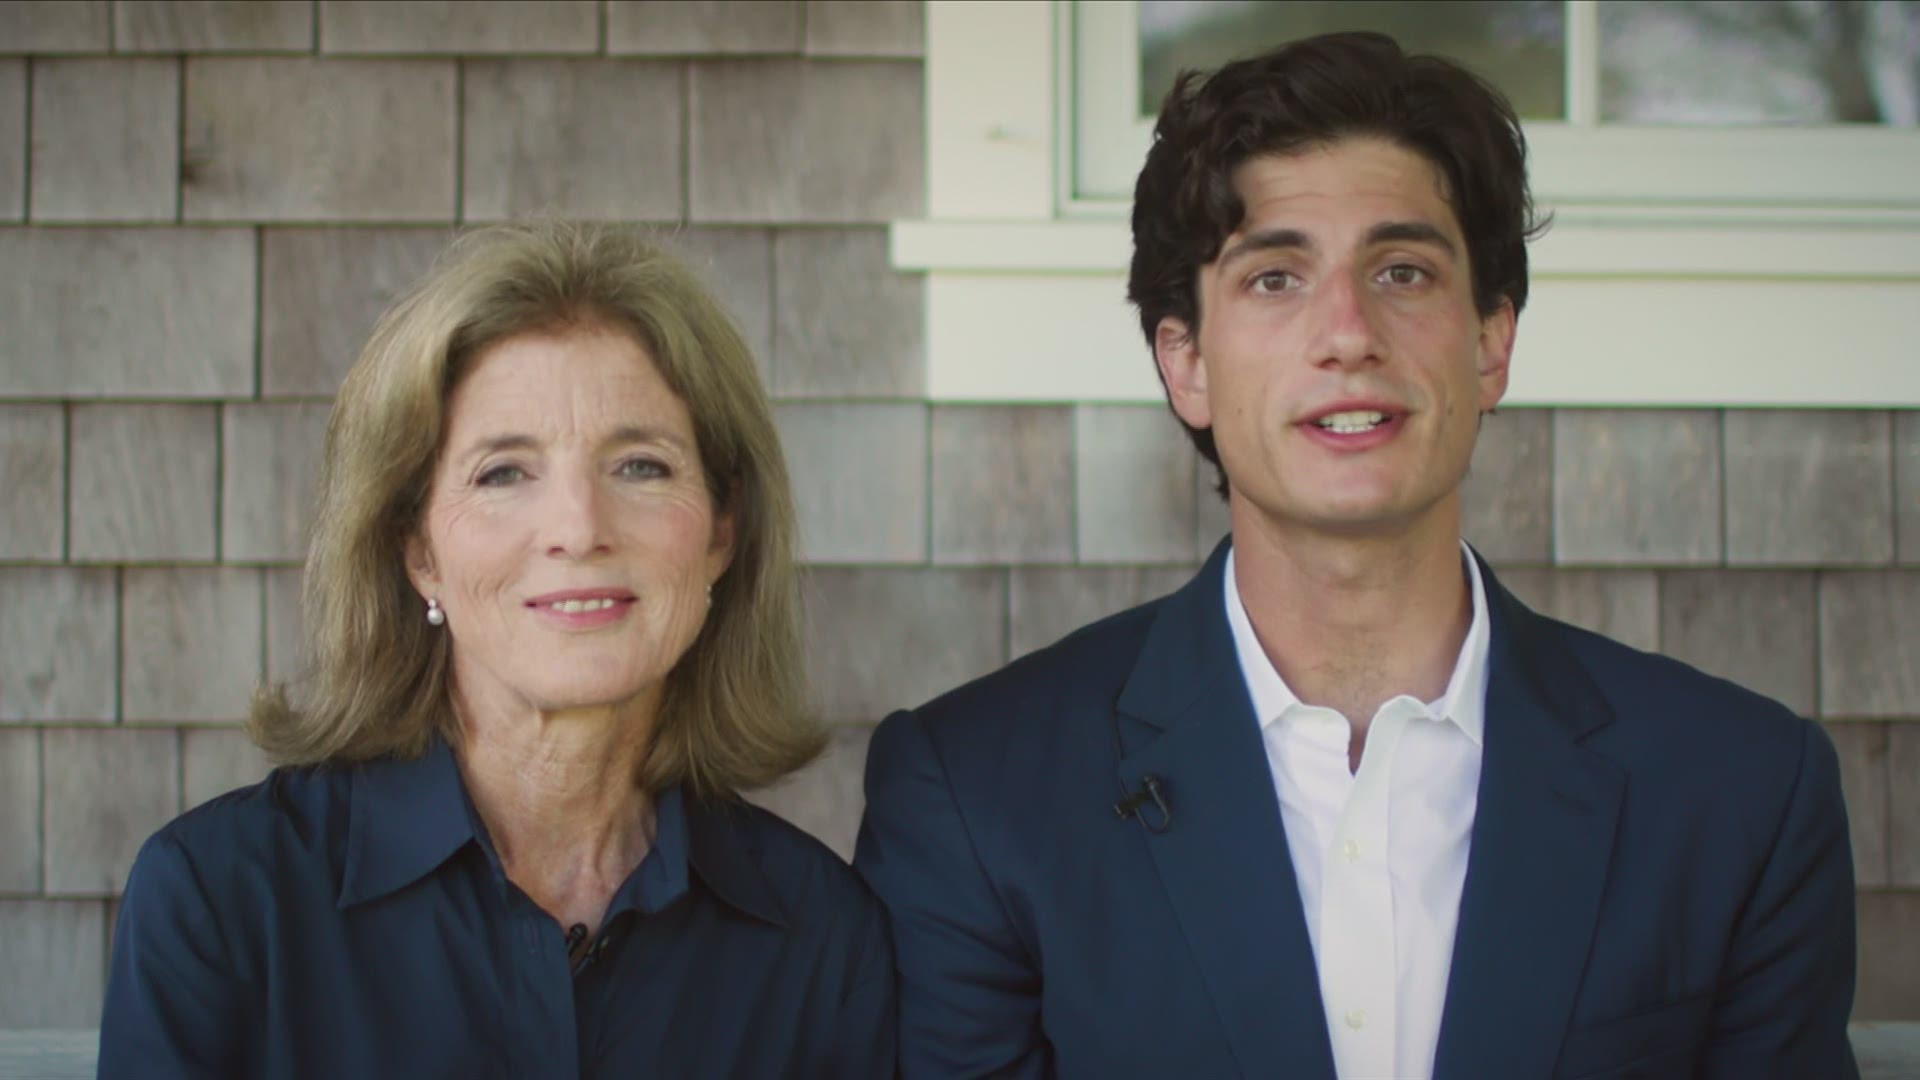 Jfk Daughter Caroline Kennedy Endorses Joe Biden At Dnc 10tv Com